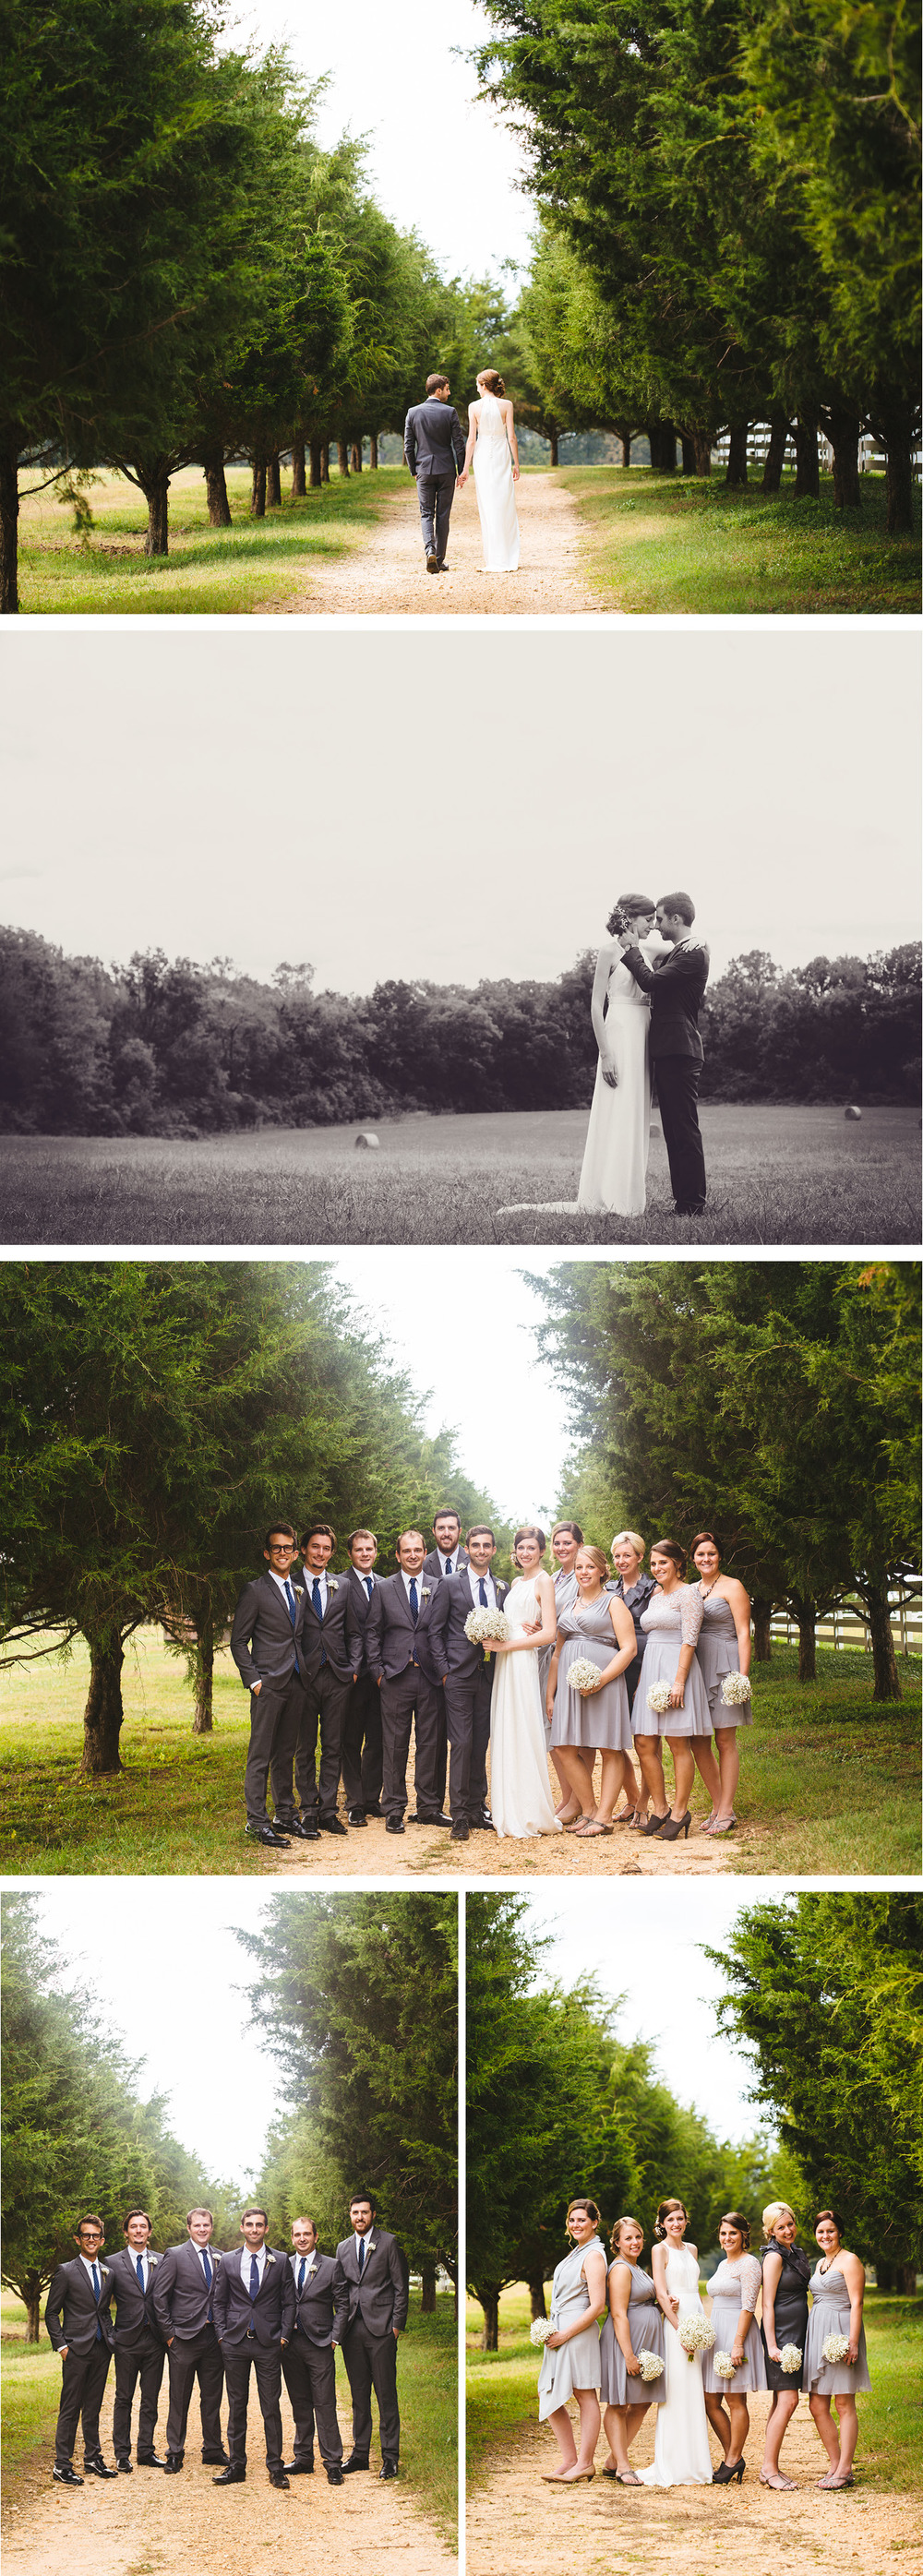 CK-Photo-Nashville-Wedding-Photographer-TN8.jpg